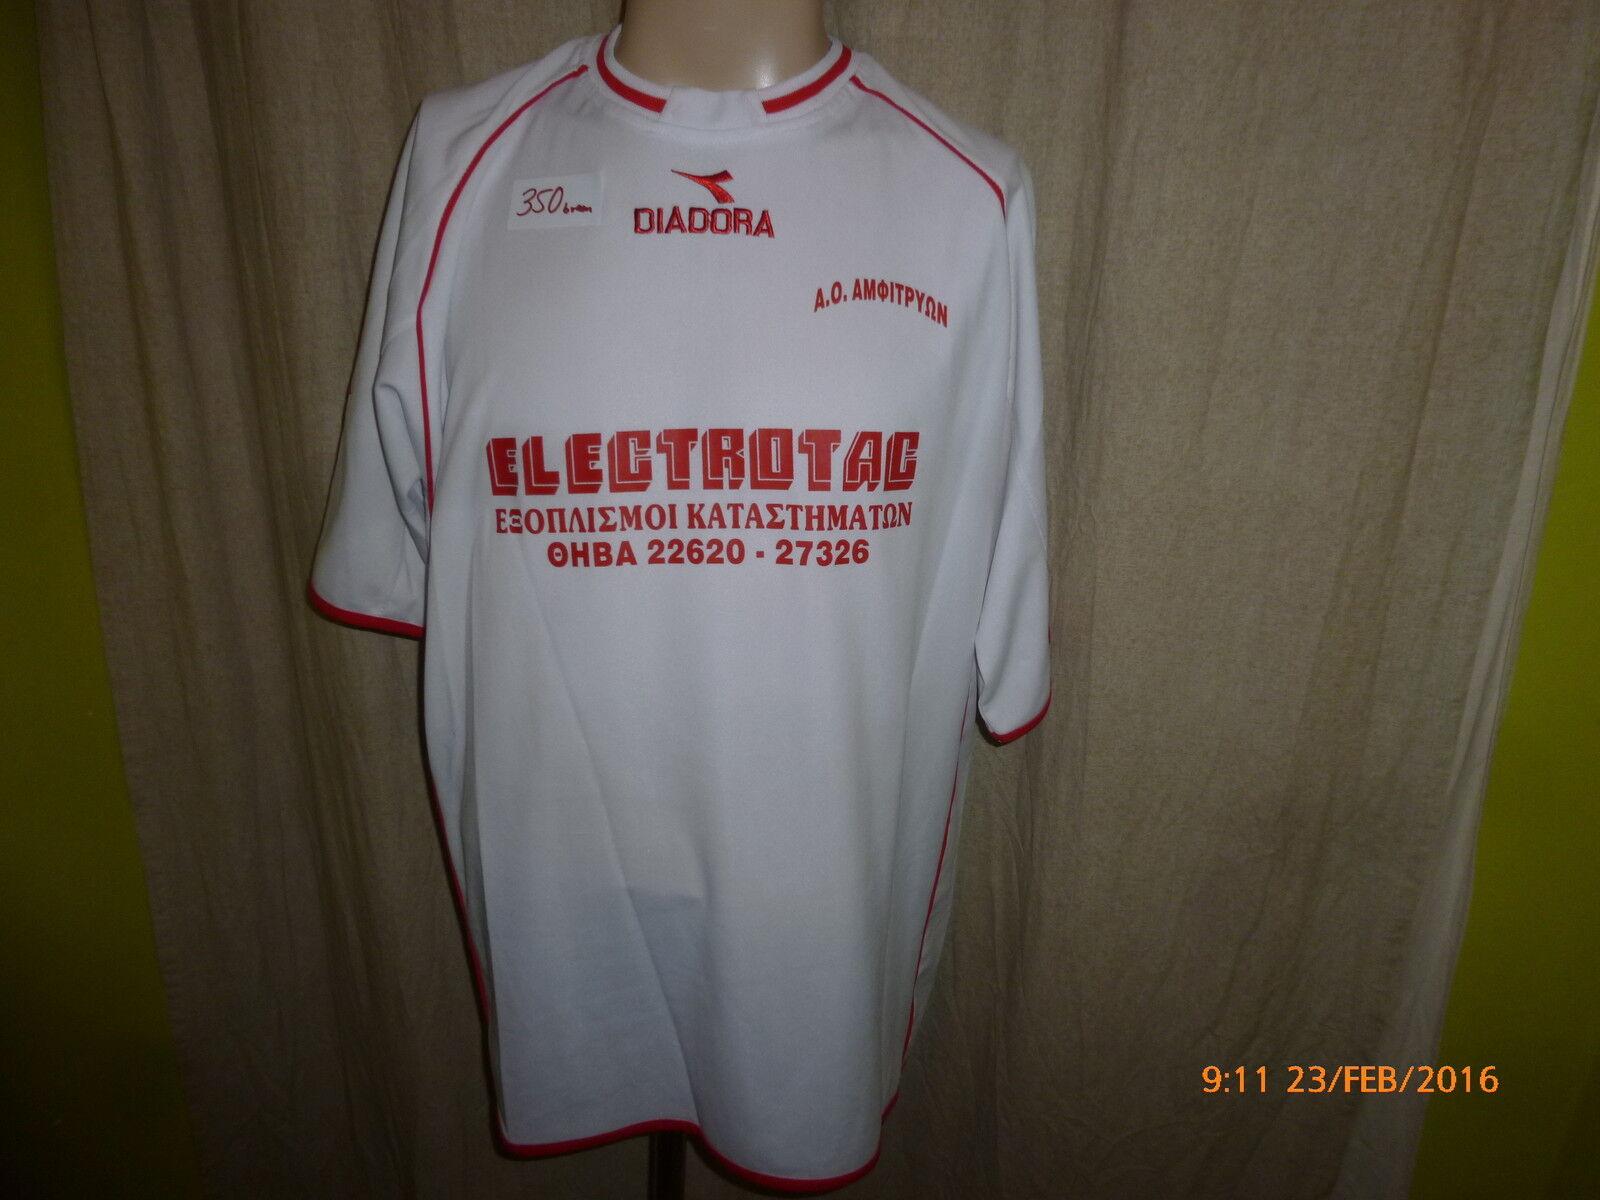 Kallithea Kallithea Kallithea FC Diadora Matchworn Trikot  ELECTROTAC  + Nr.19 Papakostandinu Gr.XL 8049e7